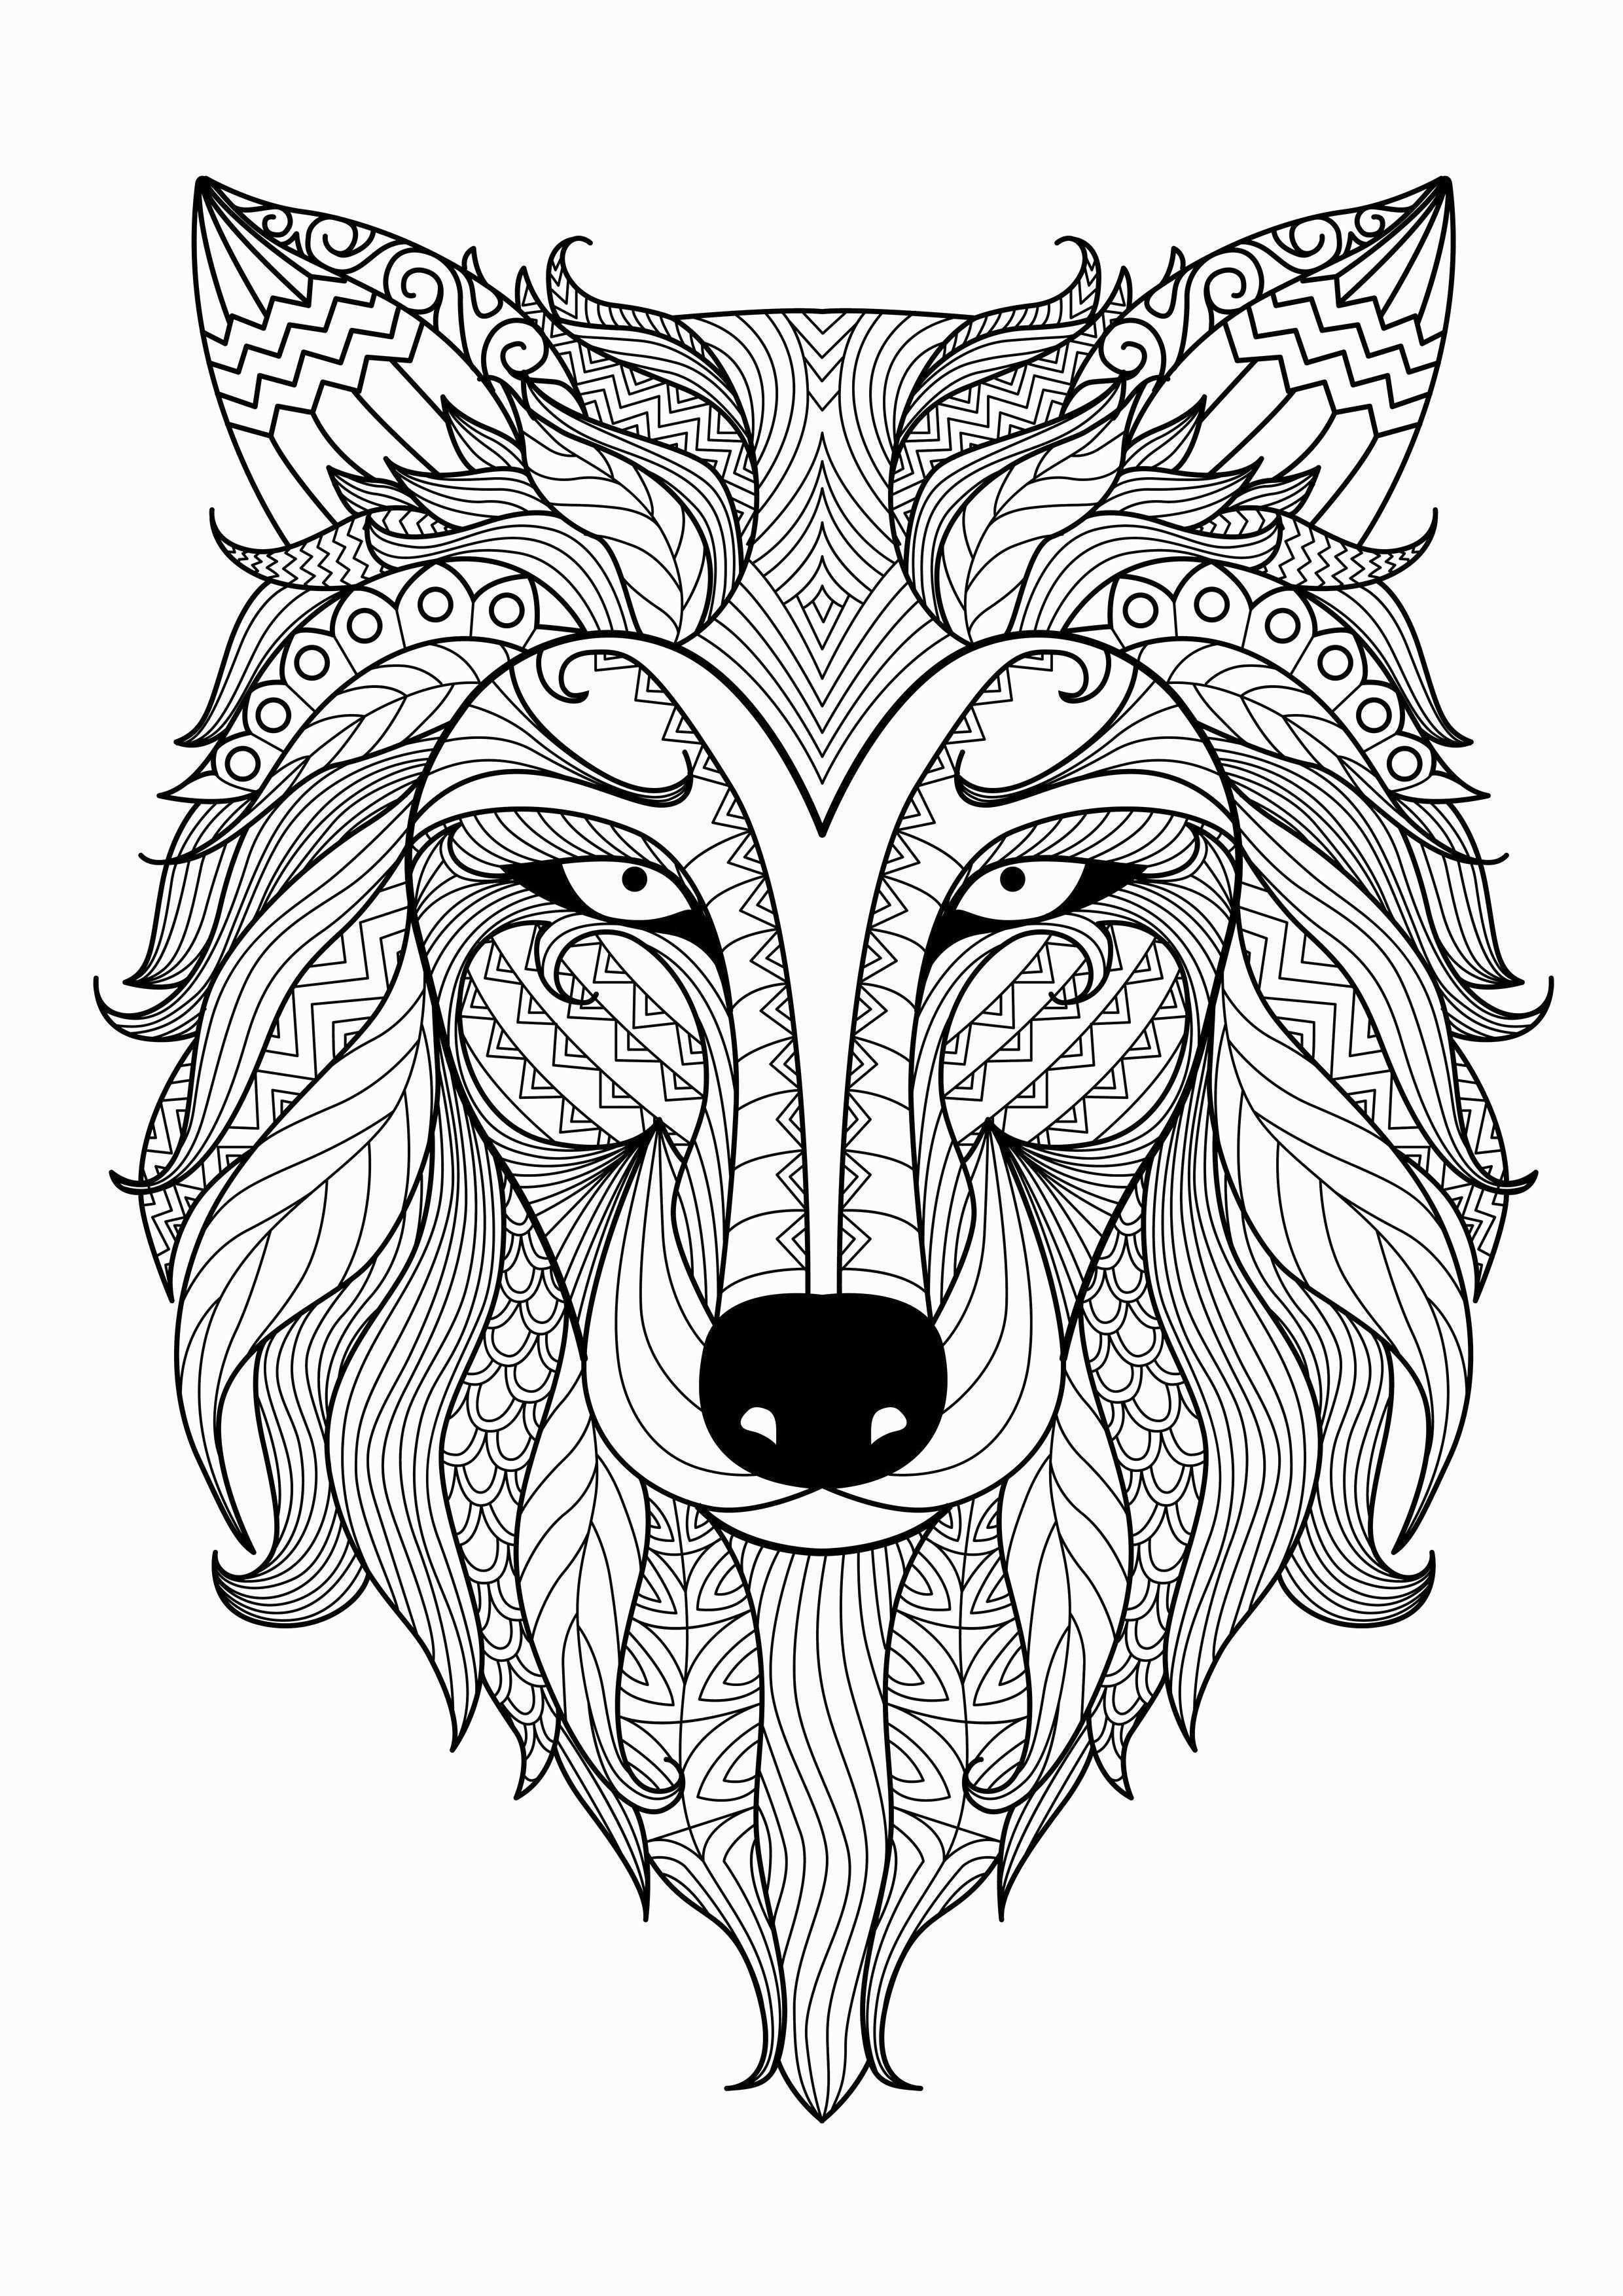 Coloring Pages Of A Tiger Luxury Printable Lion Coloring Pages Mandala Kleurplaten Dieren Kleurplaten Kleurboek